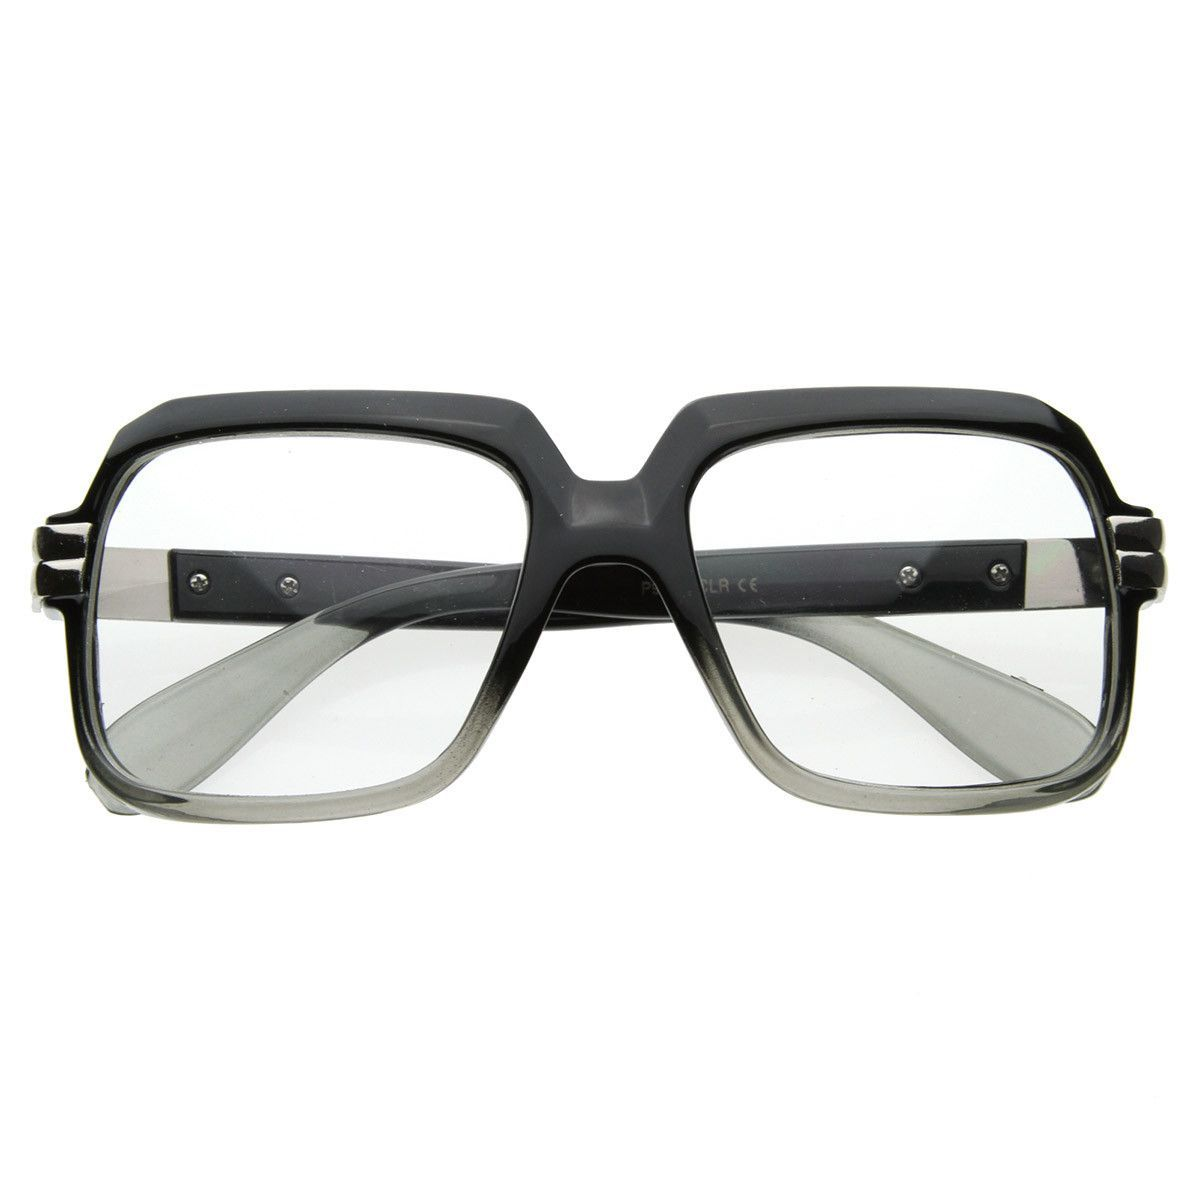 Old School Hip Hop Run Dmc Style Square Vintage Square Glasses 2981 Square Glasses Hip Hop Fashion Glasses